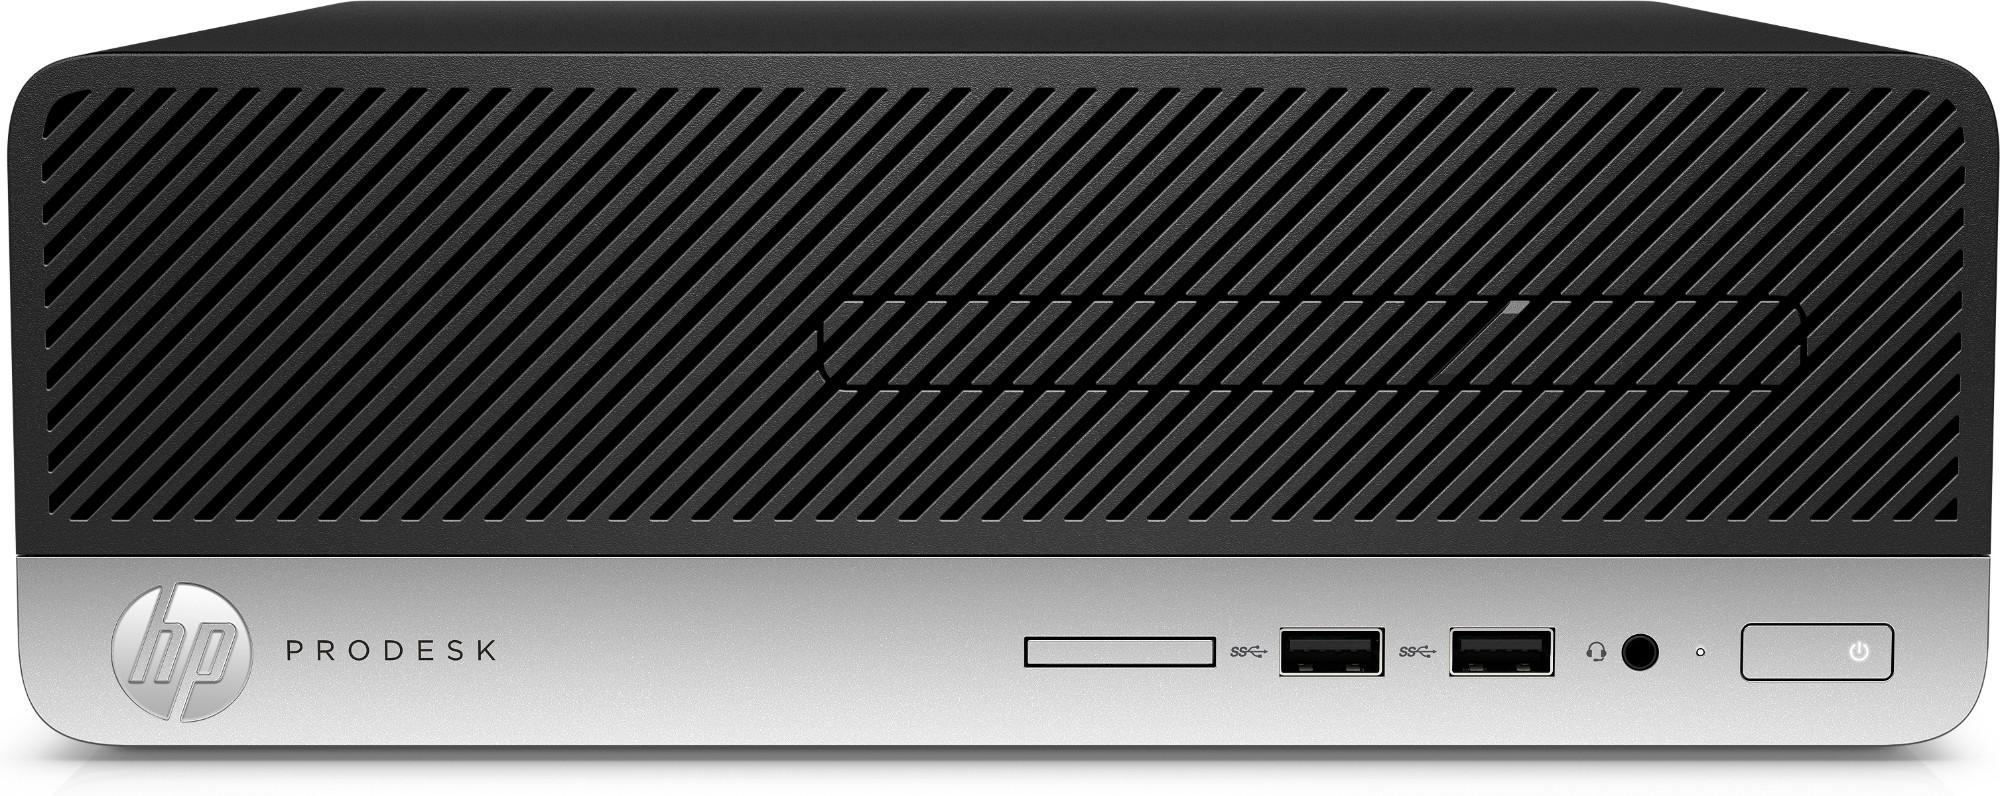 HP ProDesk 400 G5 8th gen Intel® Core™ i3 i3-8100 4 GB DDR4-SDRAM 500 GB HDD SFF Black,Silver PC Windows 10 Pro